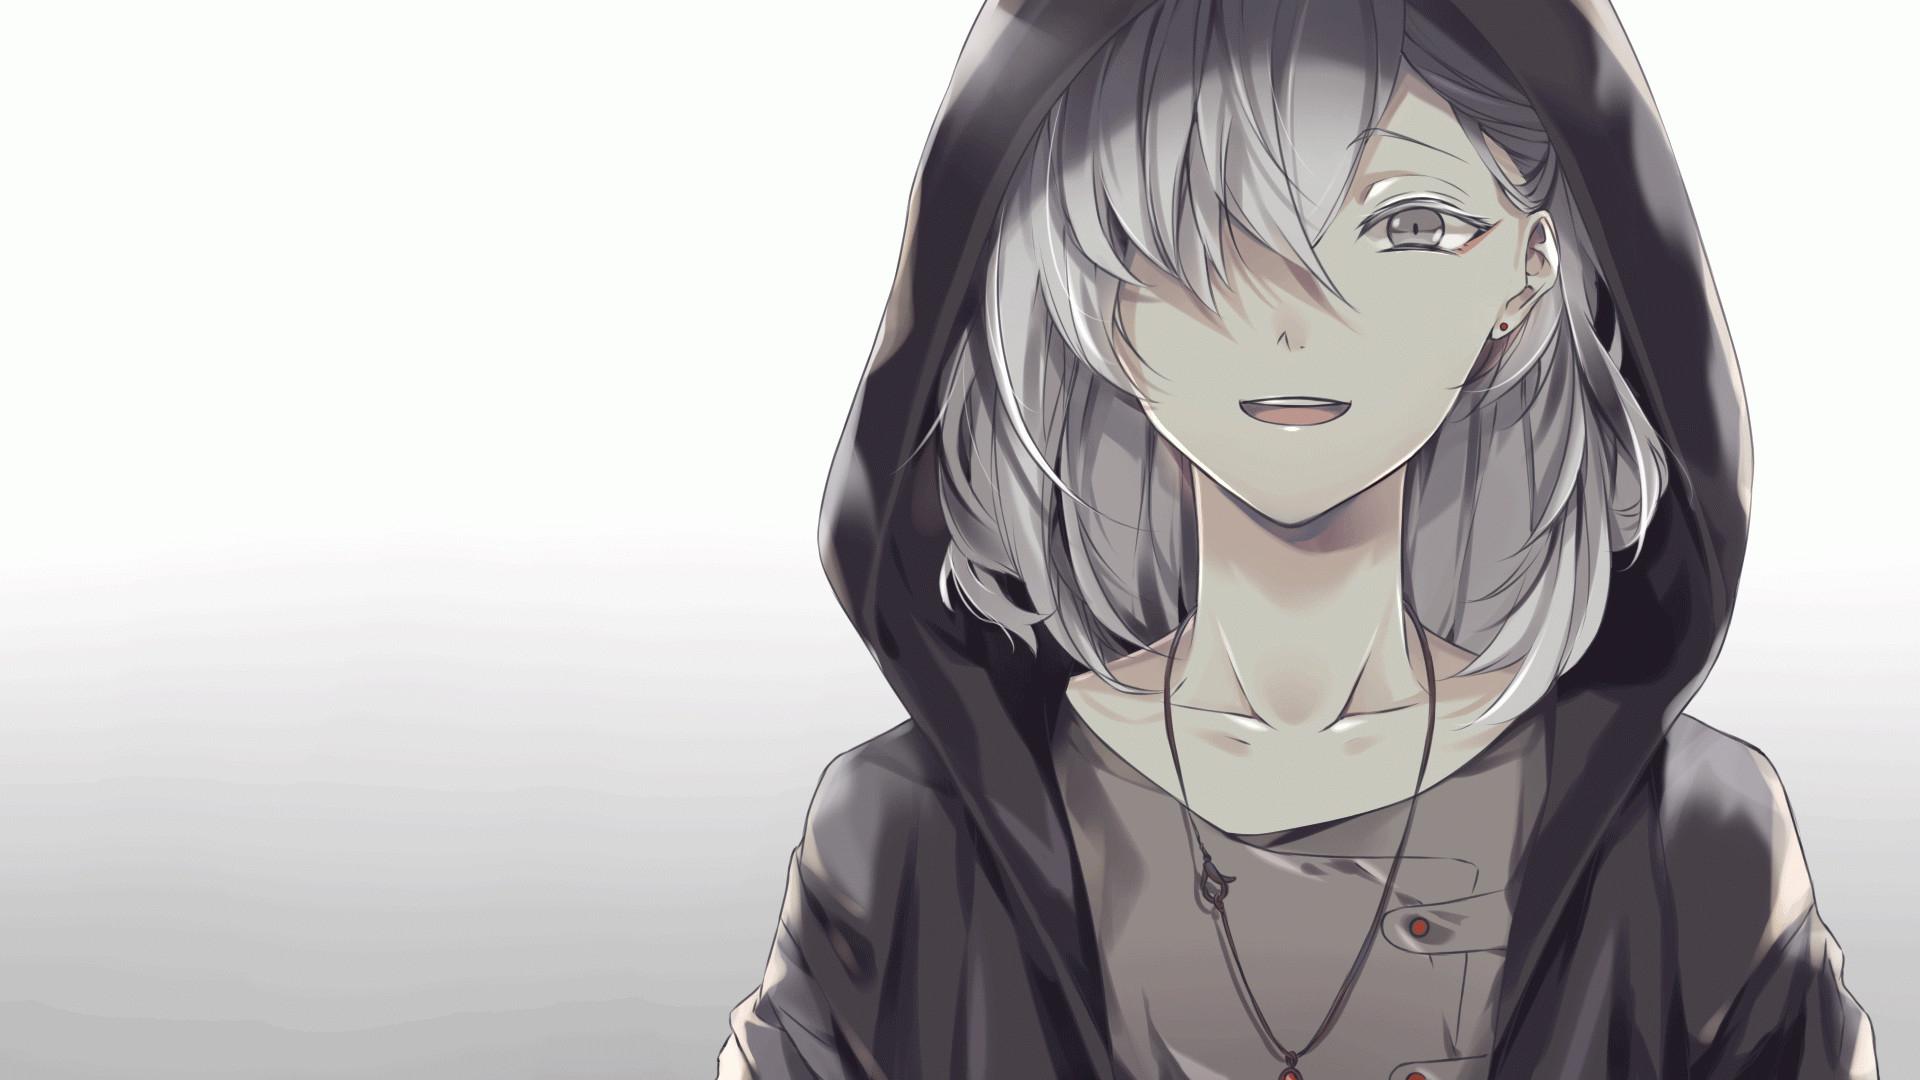 Sad Boy Anime Wallpaper Hd Fitrinis Wallpaper